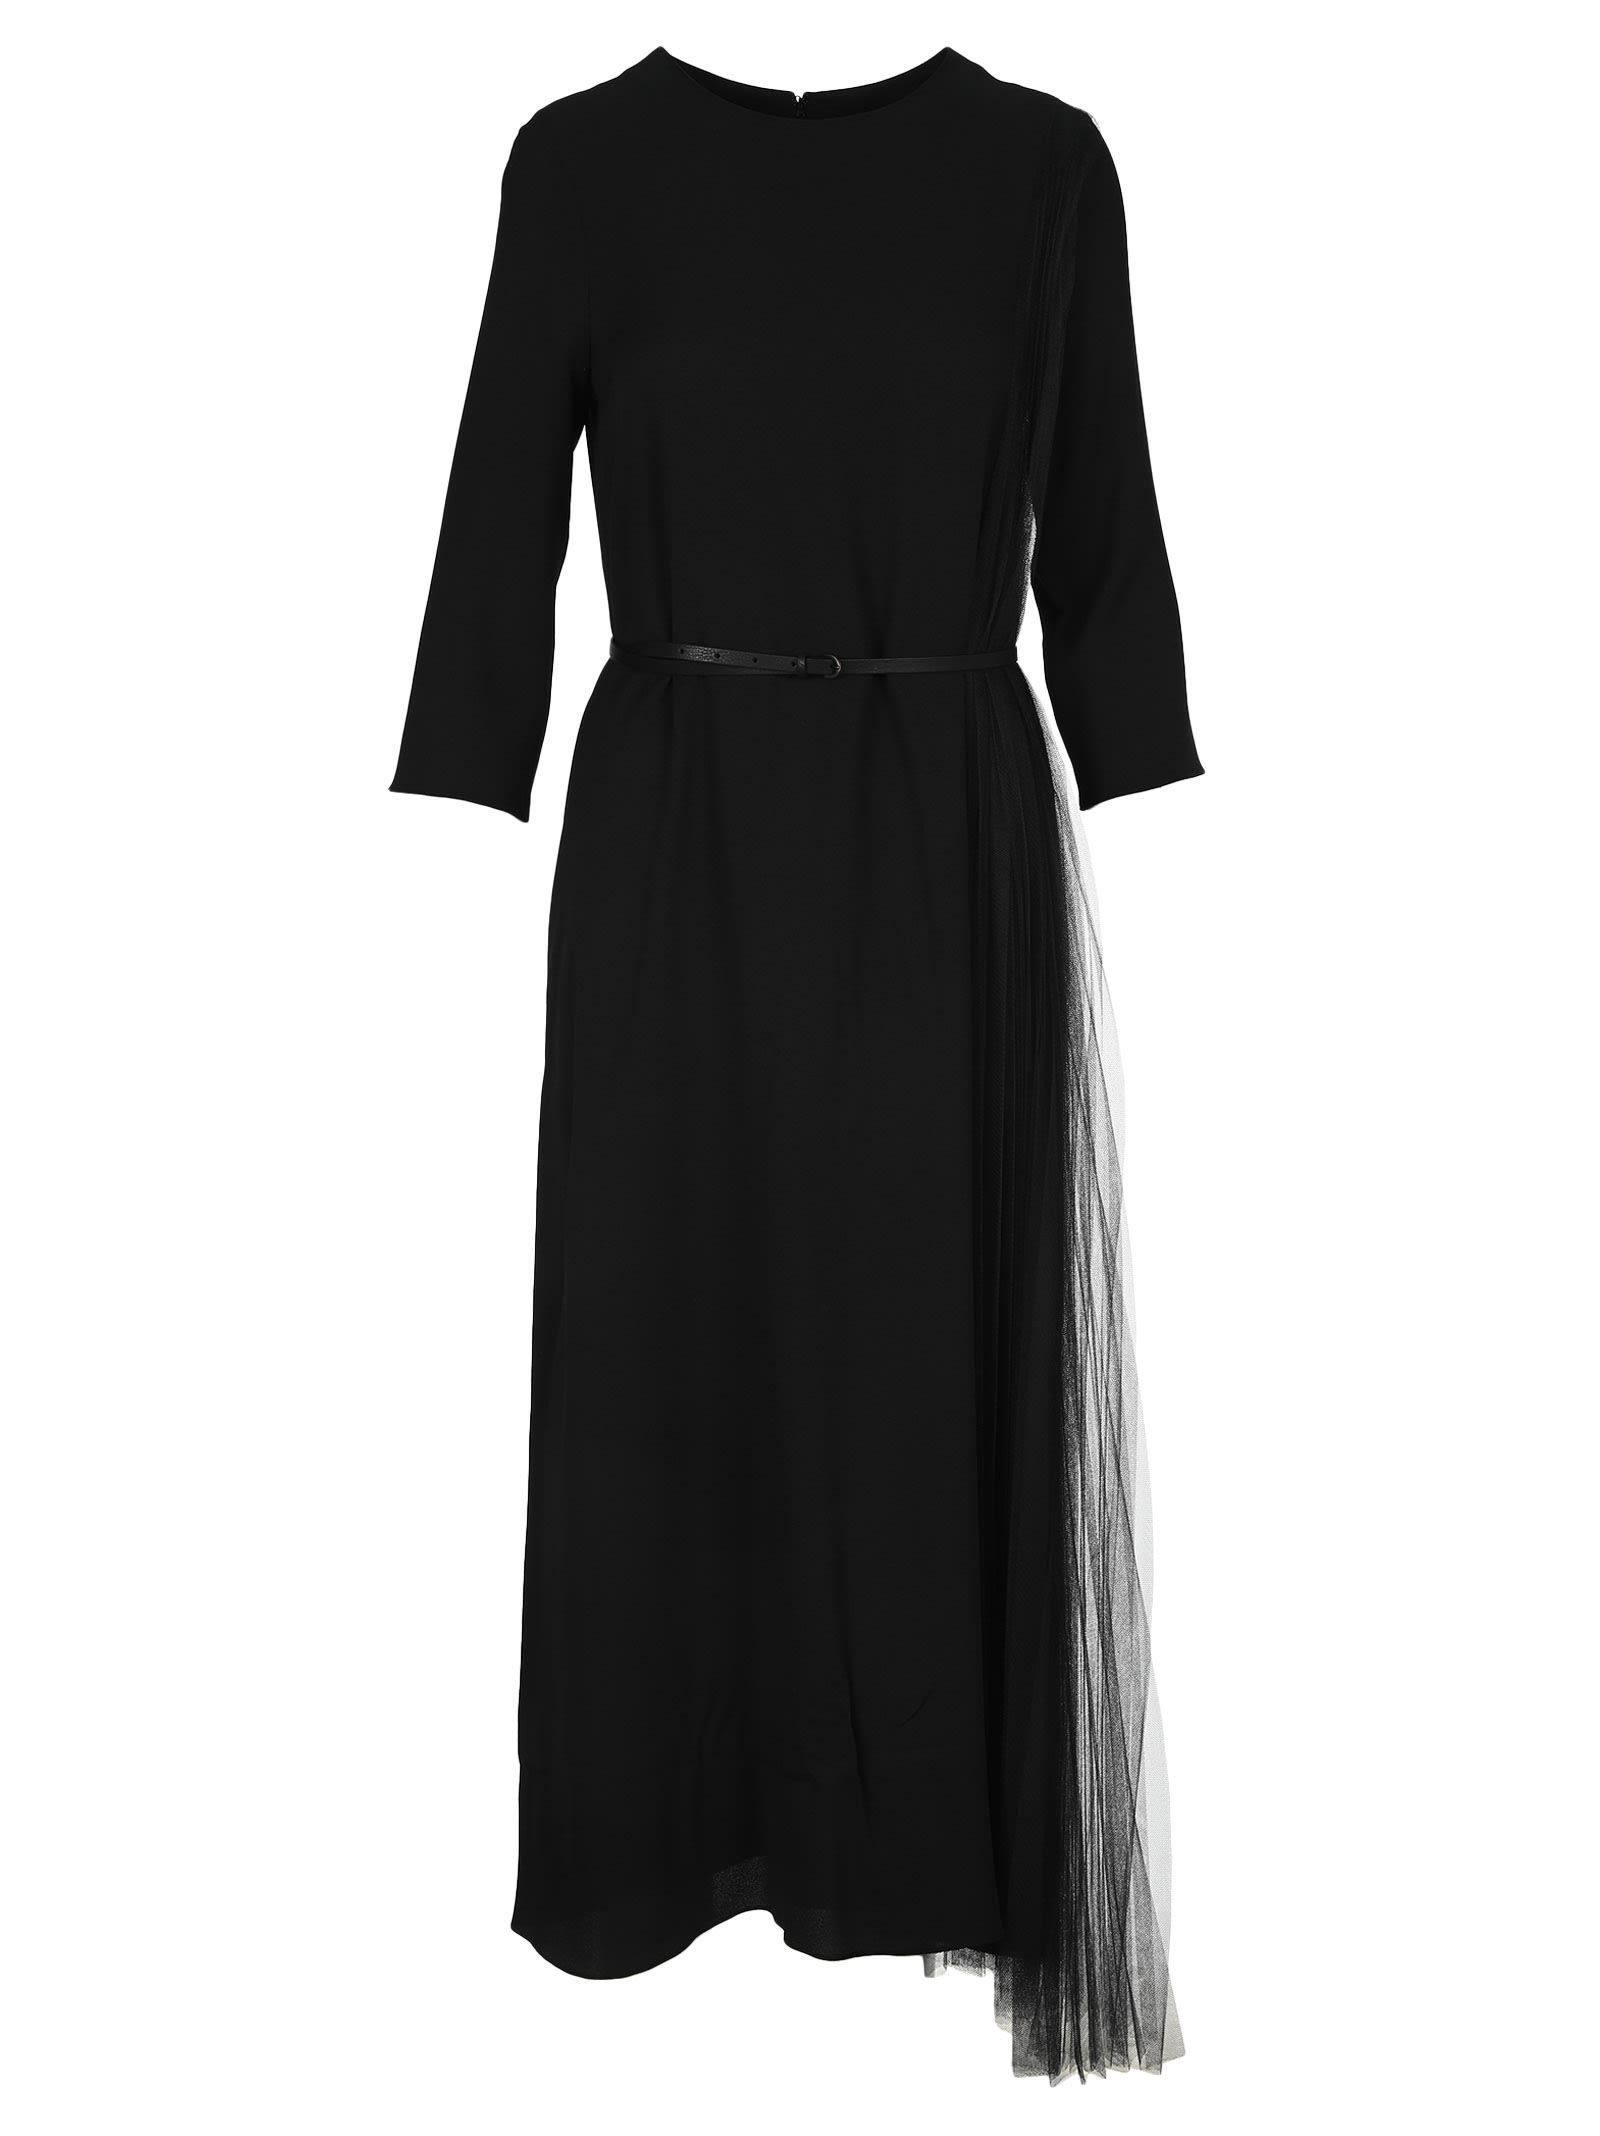 Buy Fabiana Filippi Tulle Insert Maxi Dress online, shop Fabiana Filippi with free shipping